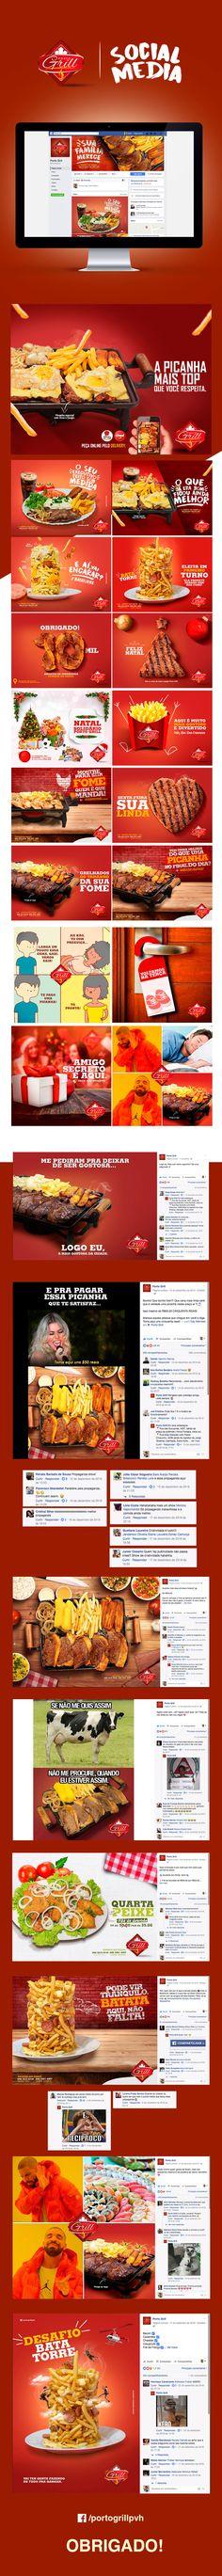 Porto Grill - Mídias sociais on Behance